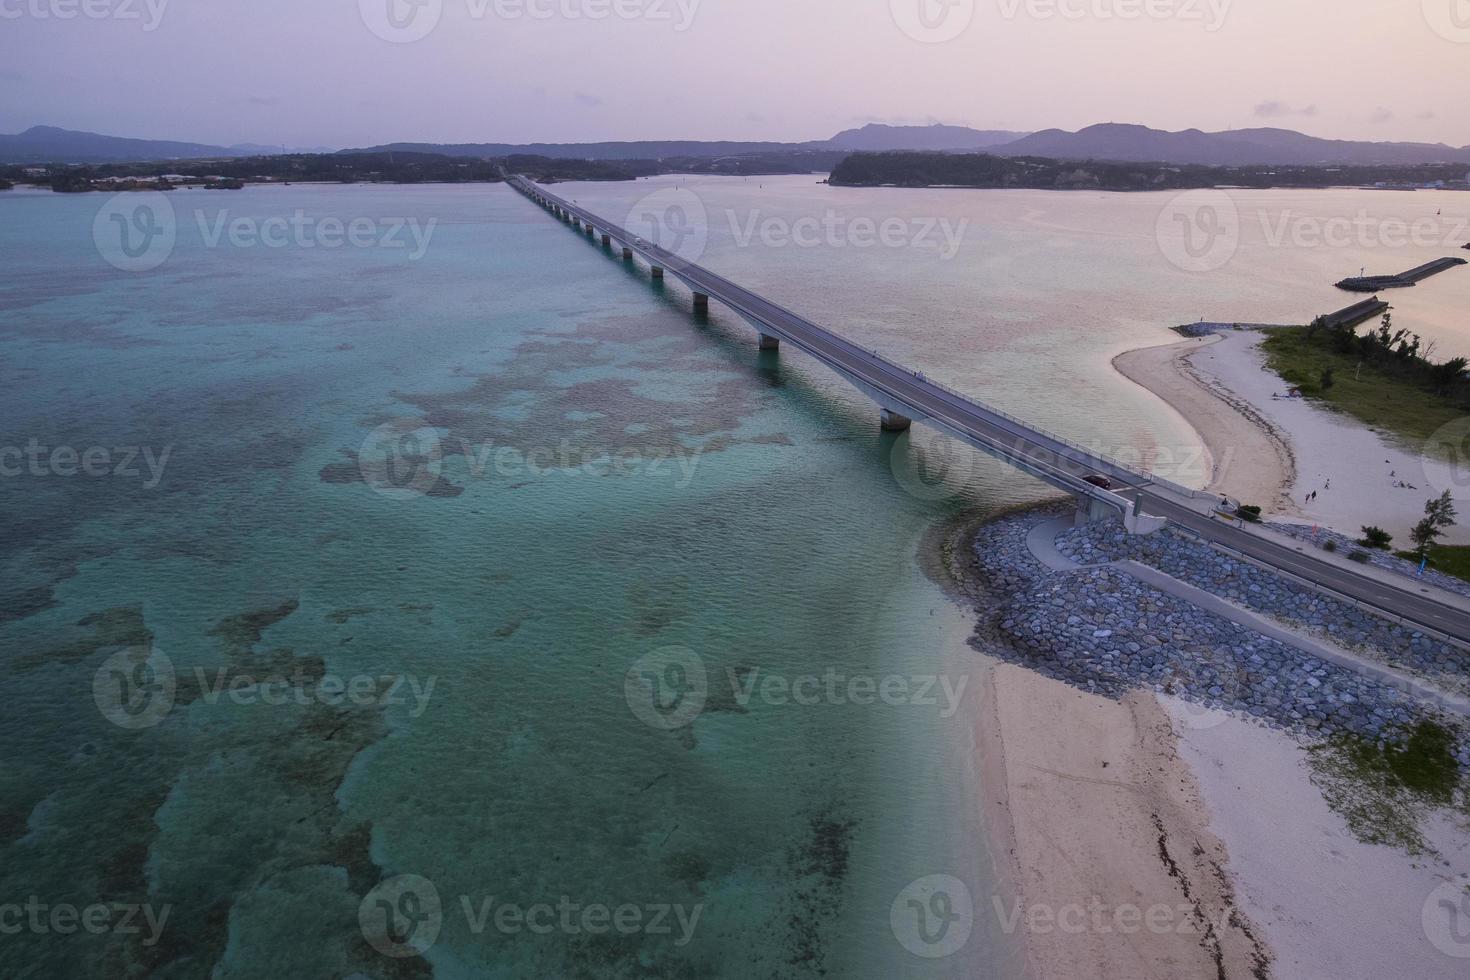 okinawa sunset droneaerialshoot kouri island 古 字 利 島 foto